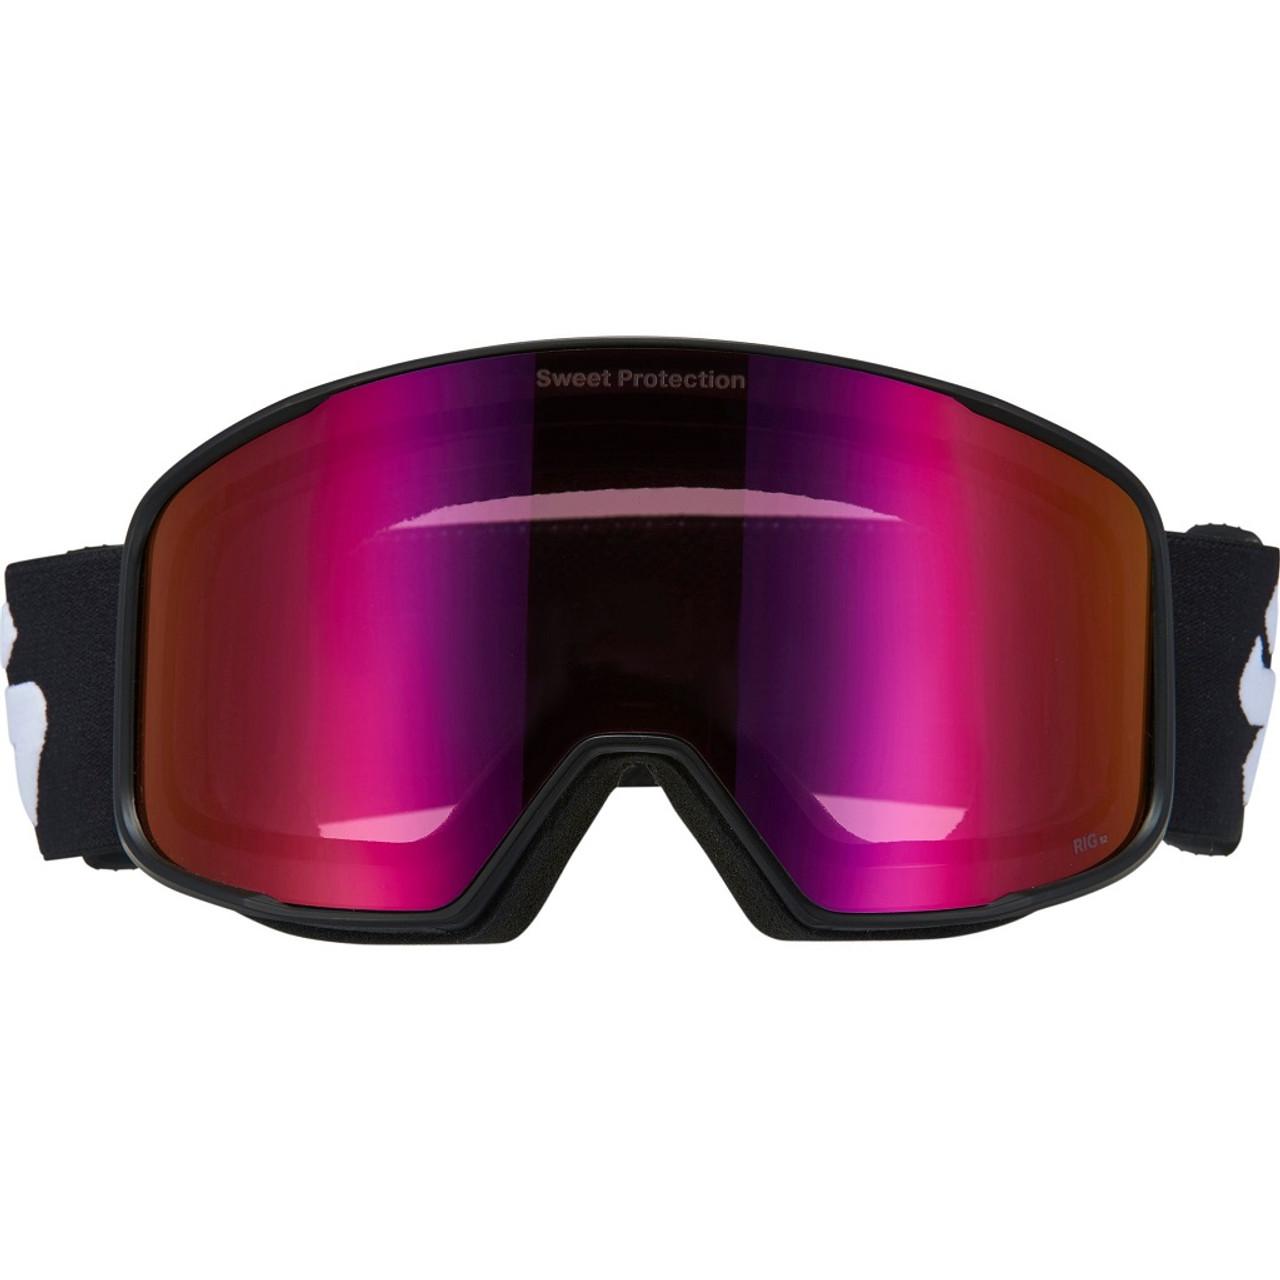 RIG Reflect Bixbite - Sweet Protection Boondock Lenses